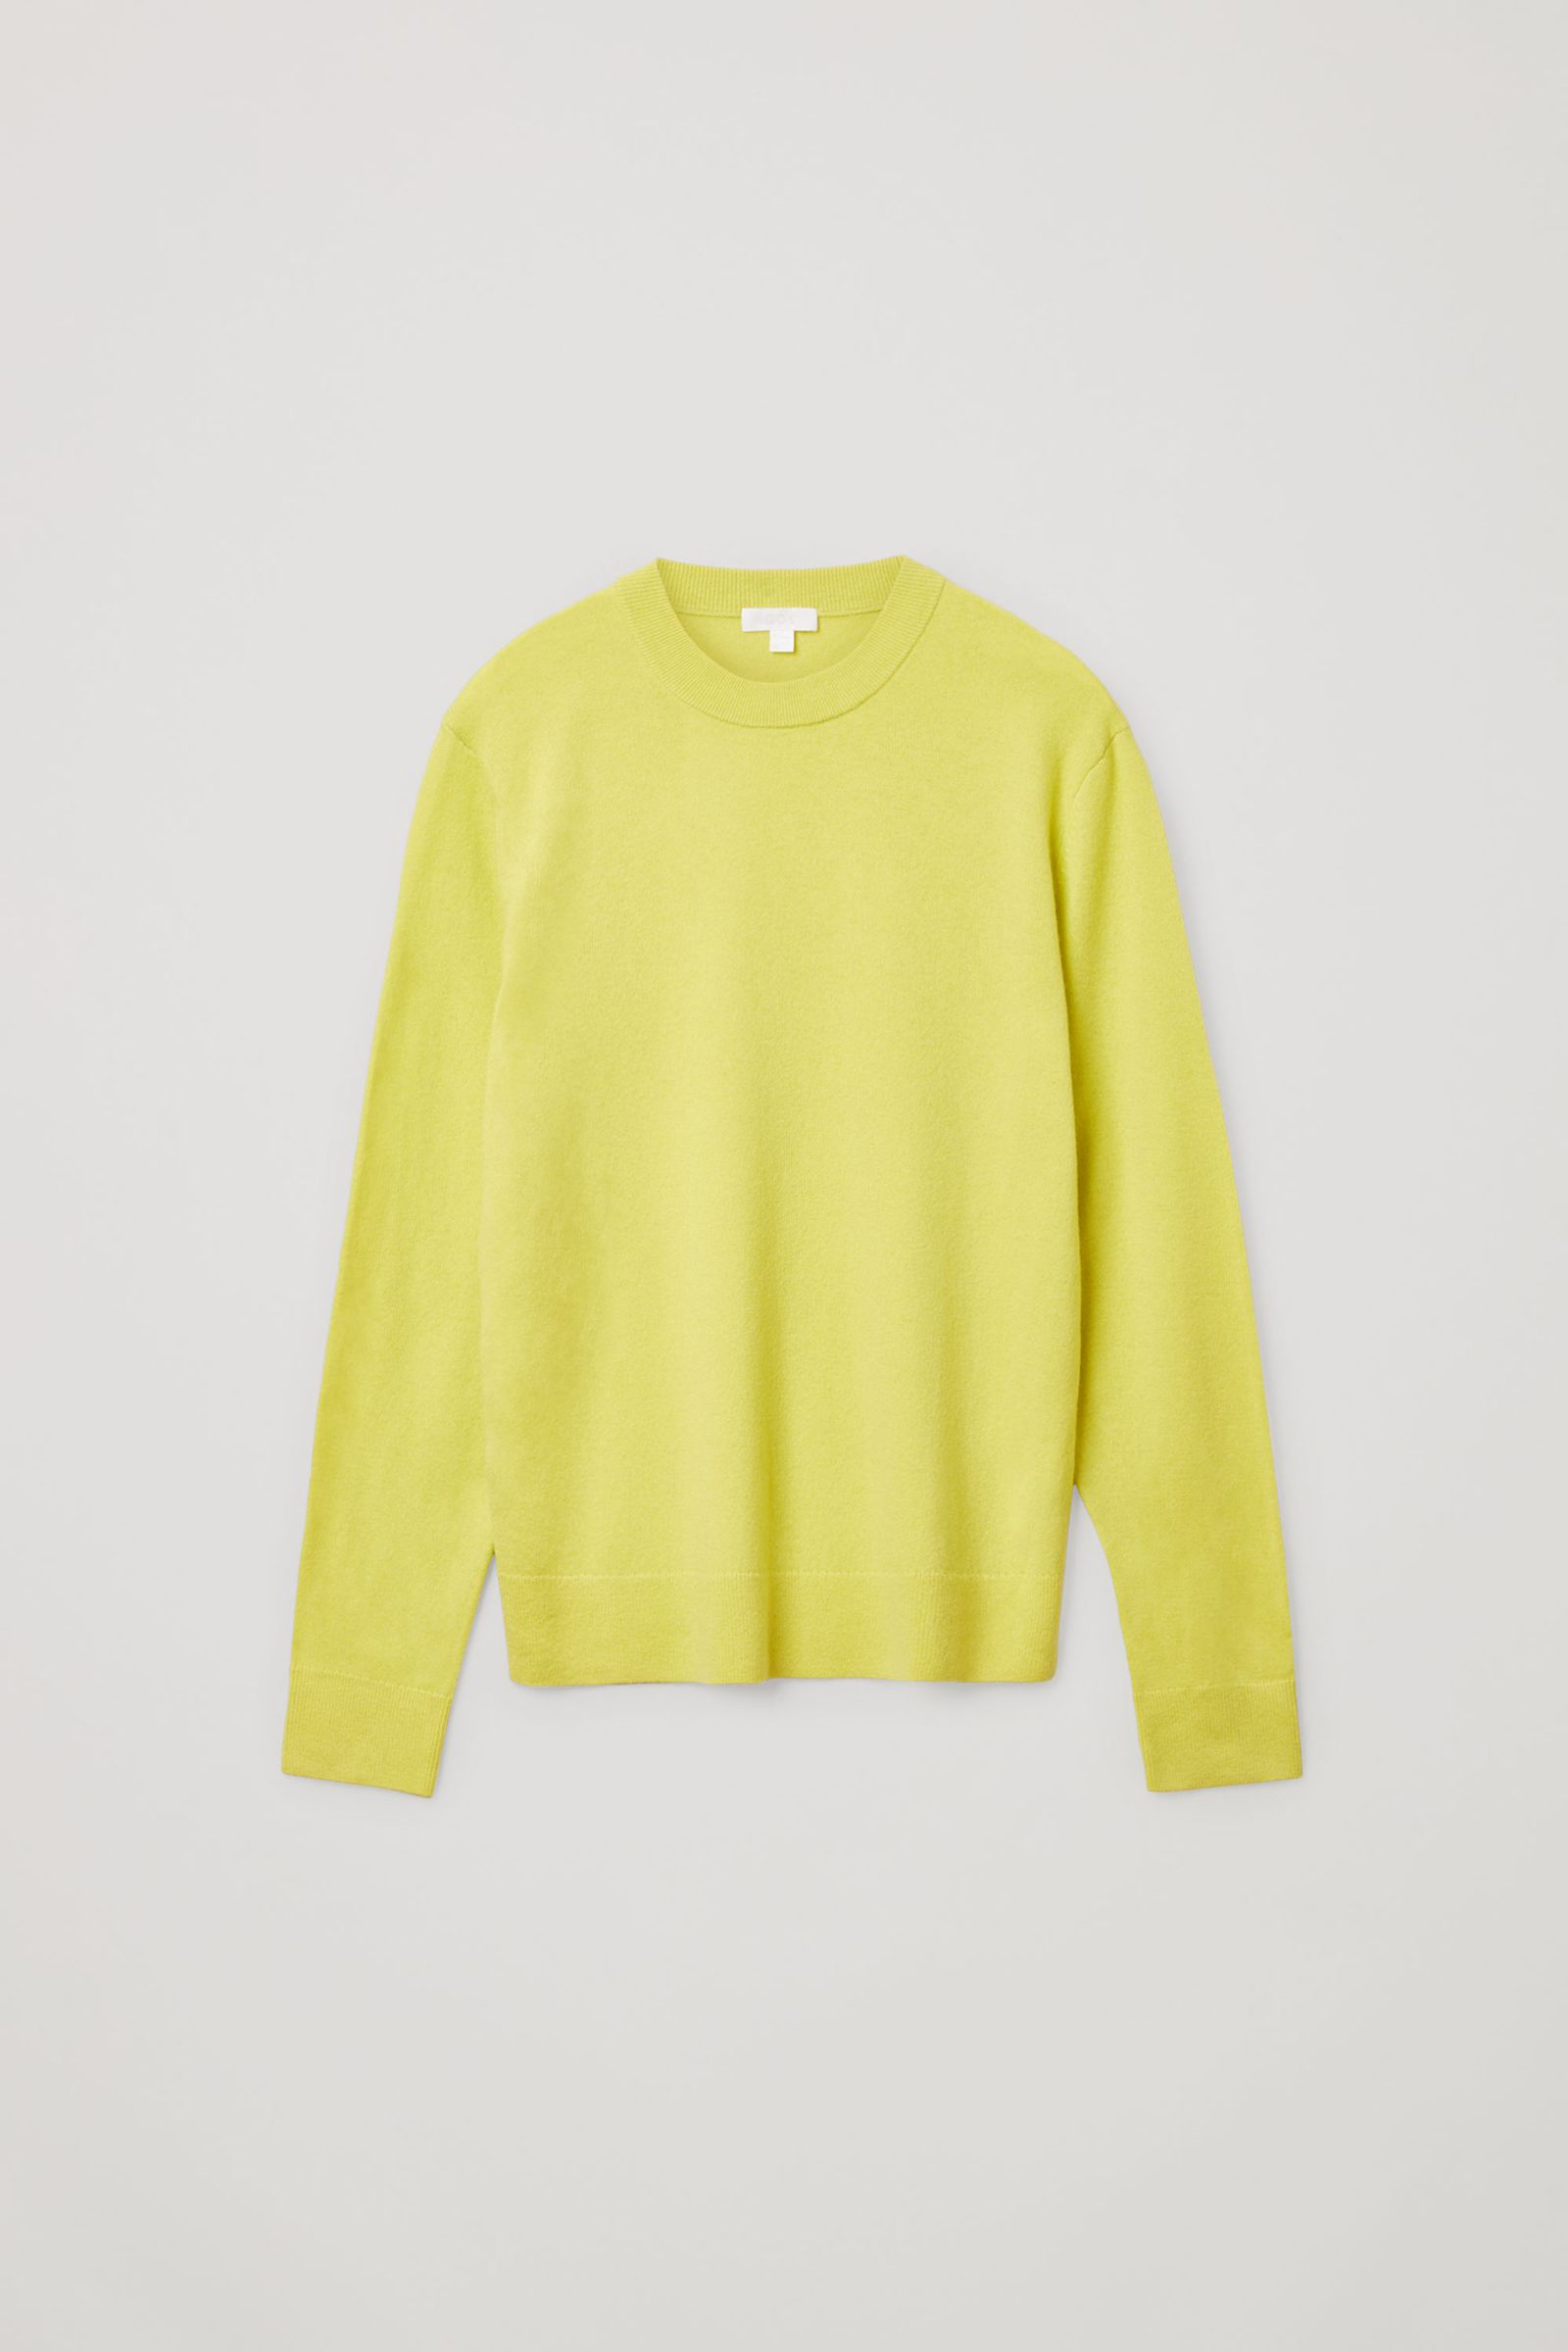 COS 메리노 야크 크루넥 스웨터의 옐로우컬러 Product입니다.